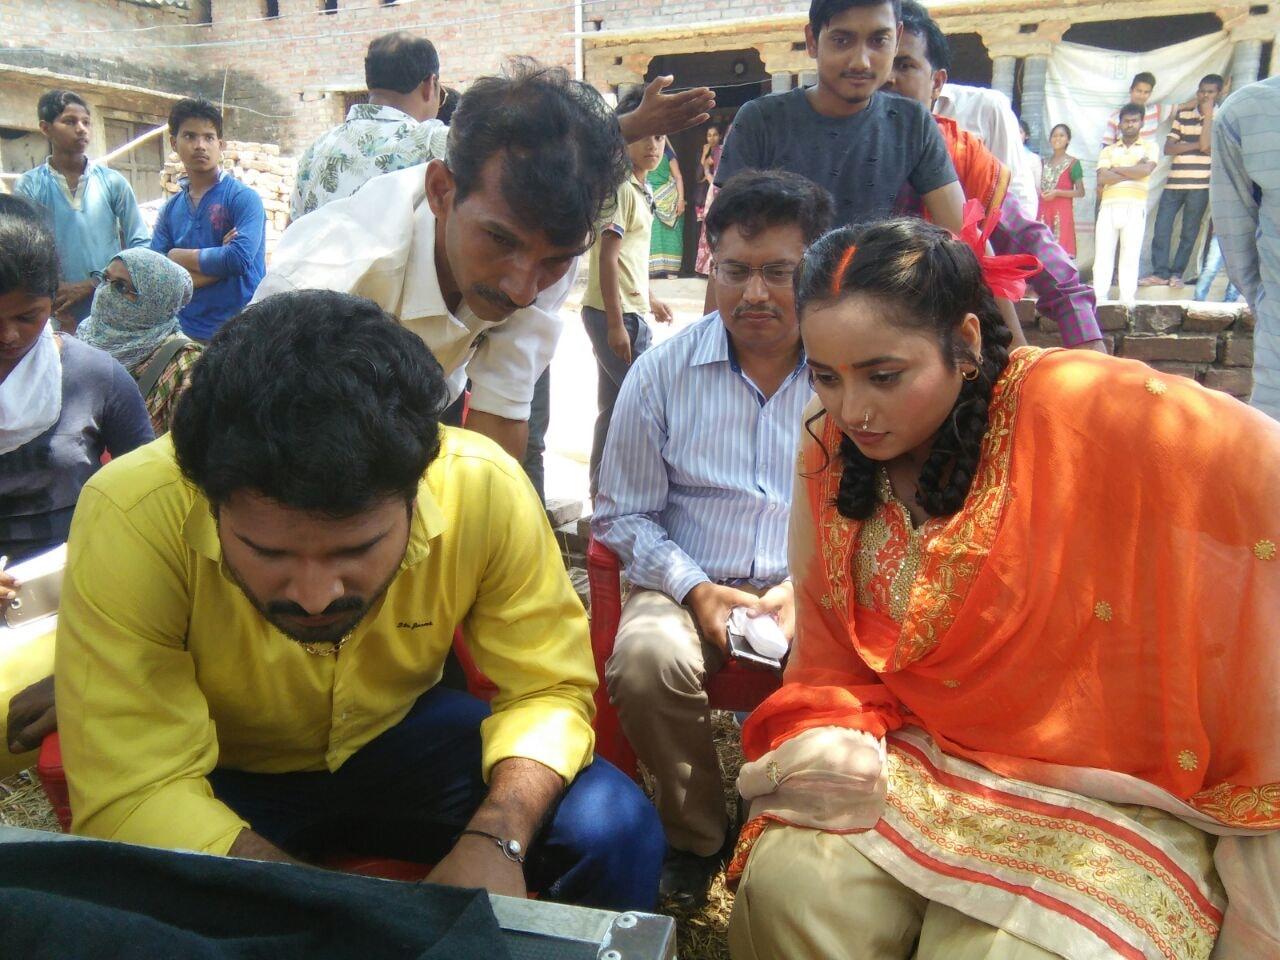 Rani Chatterjee and Riteish Pandey together film 'Rani Weddes Raja'